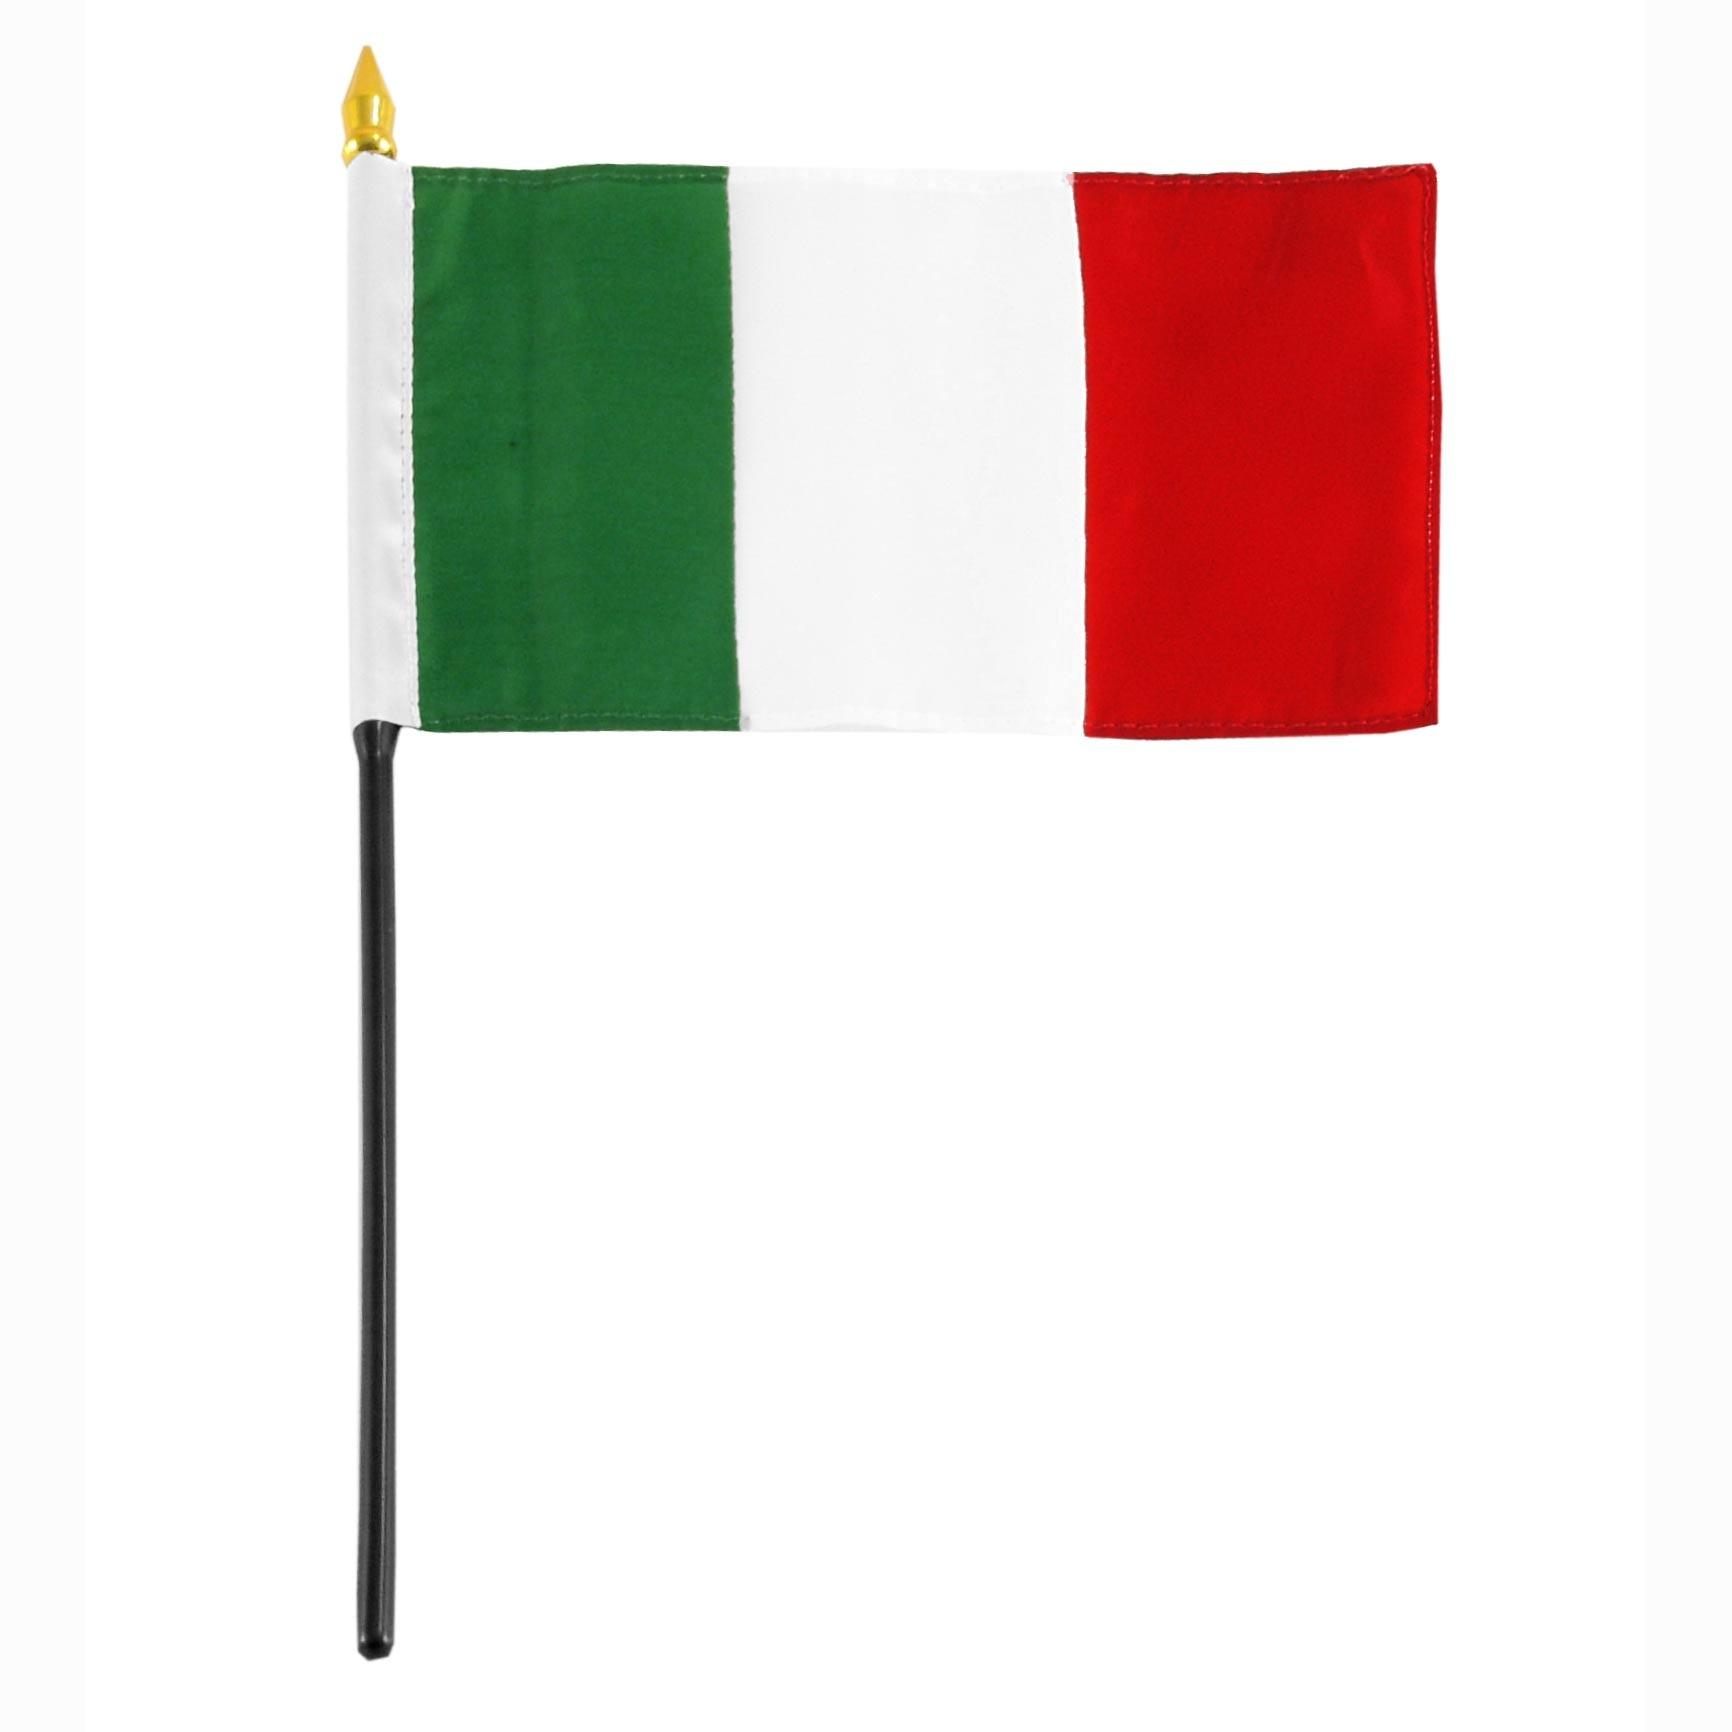 Buy Italian Flags, Flag of It - Italian Flag Clip Art